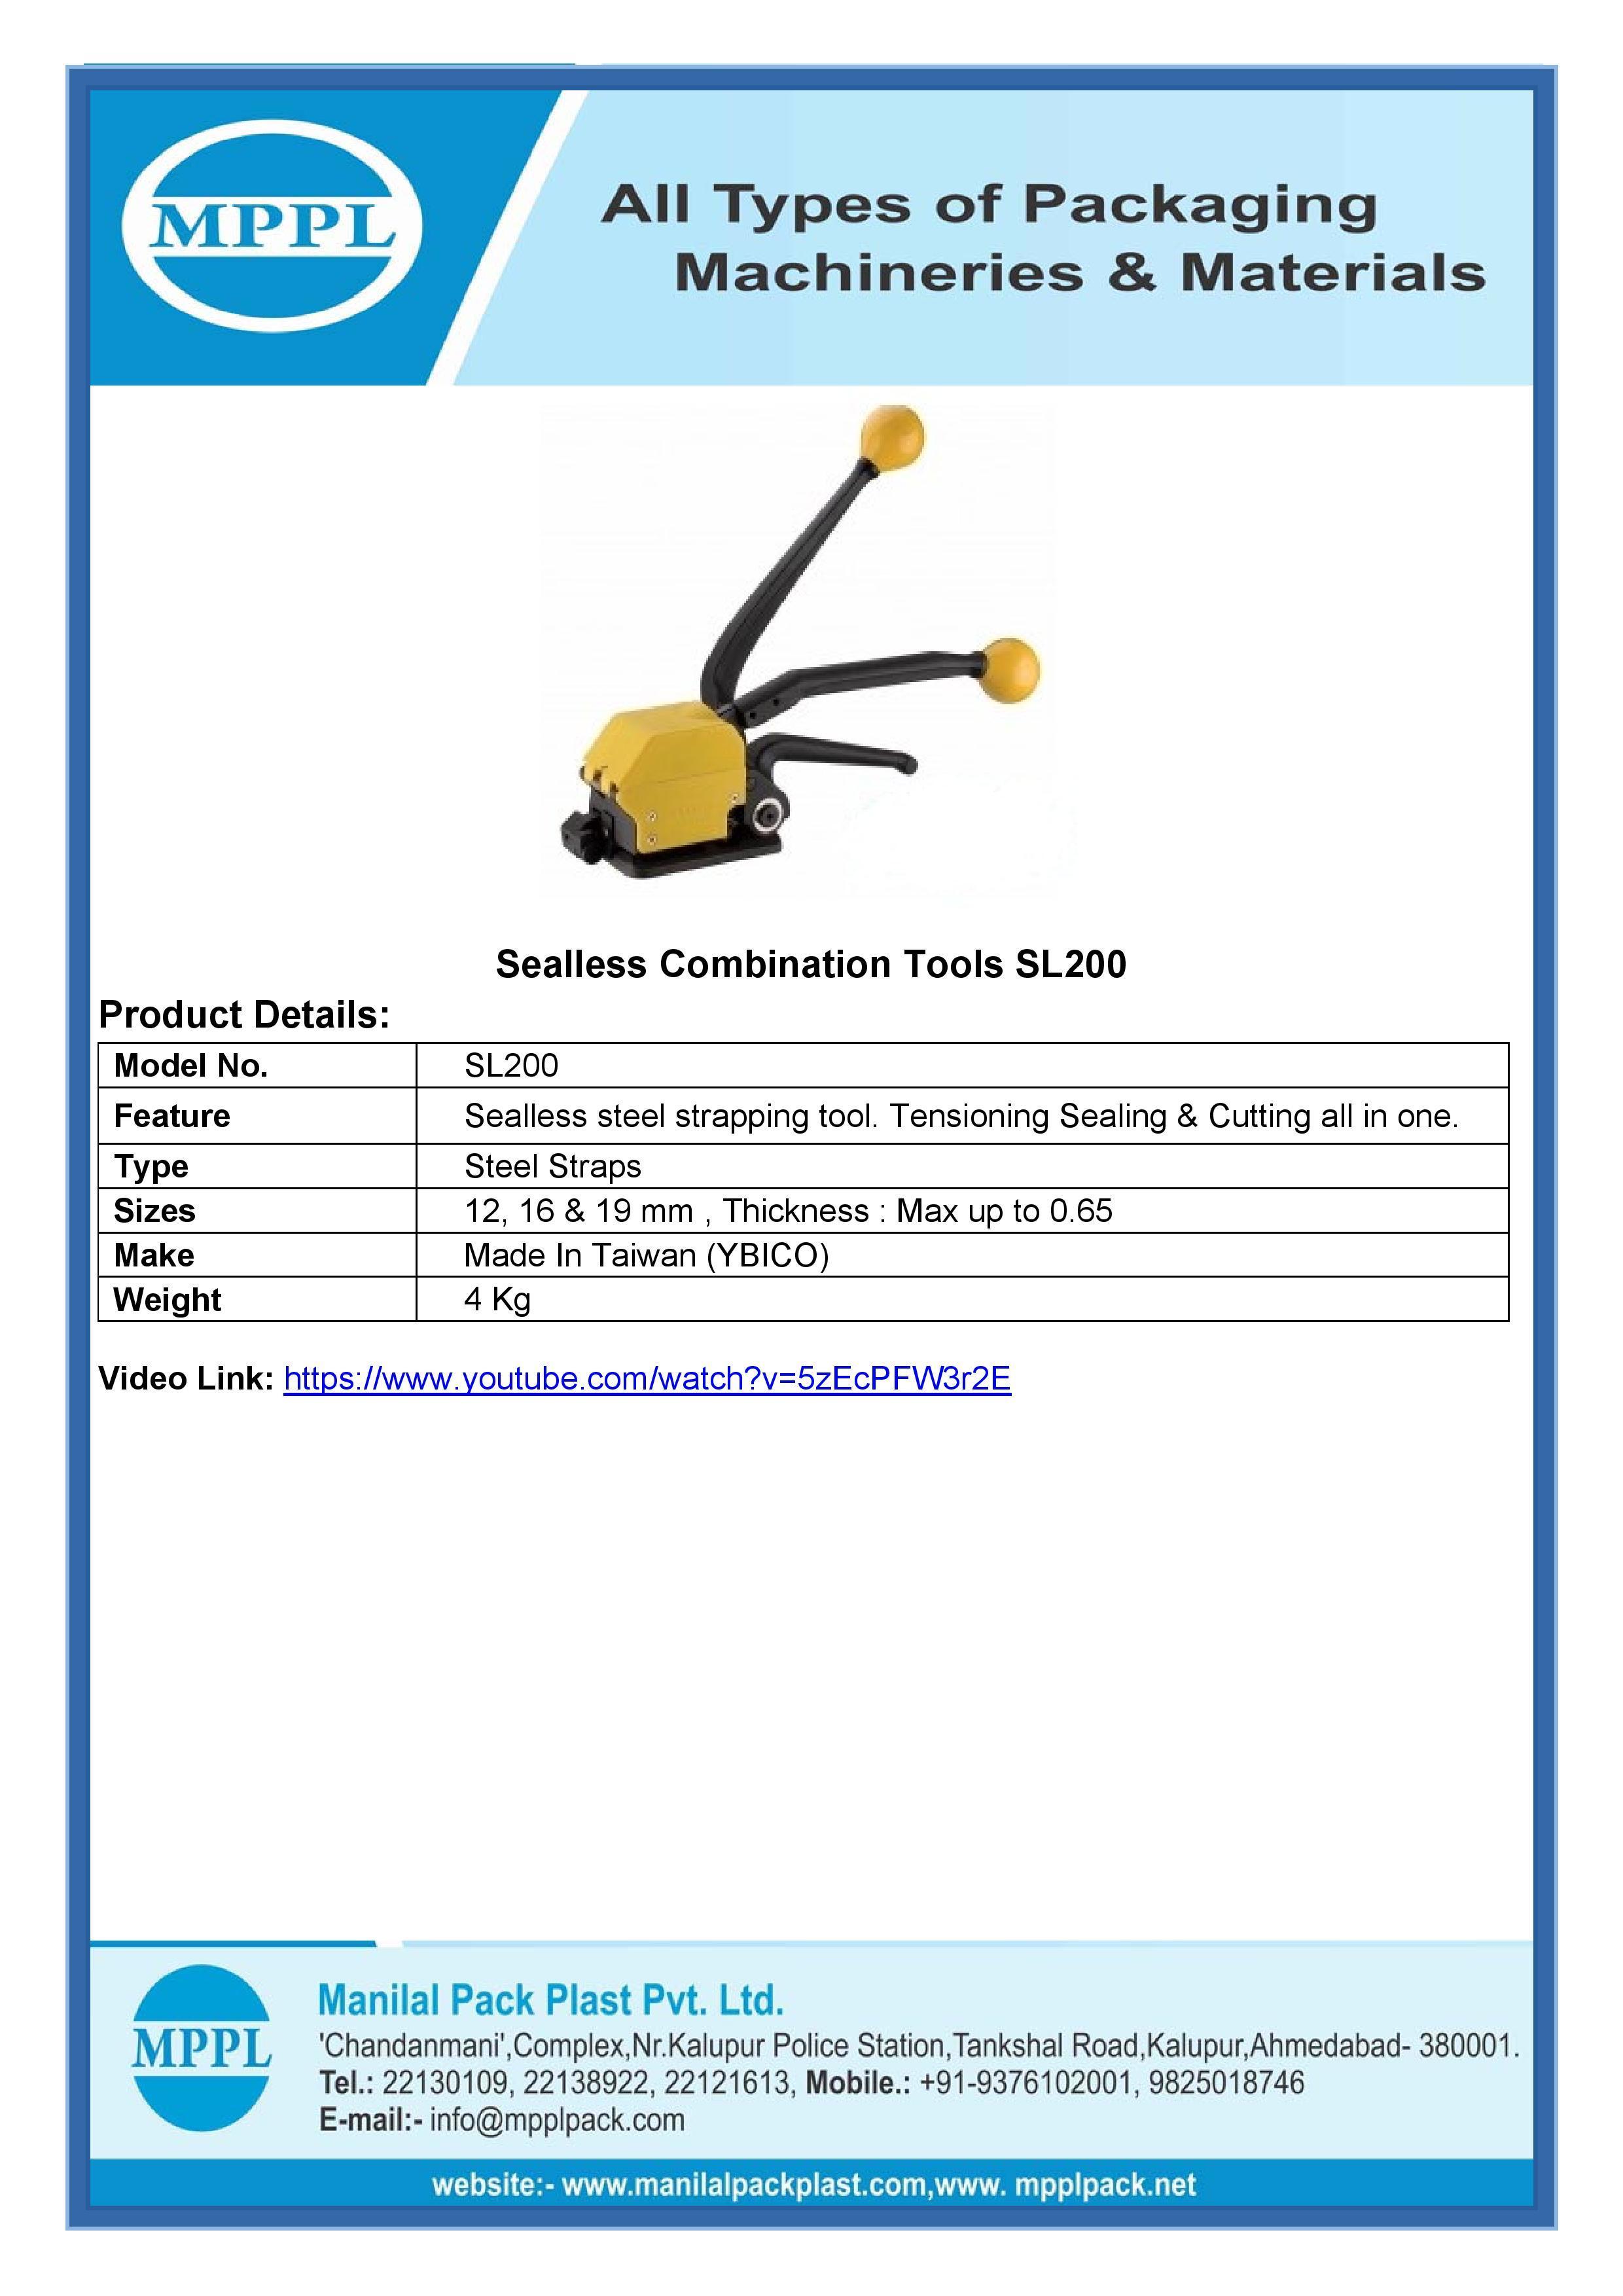 Sealless Combination Tools SL200